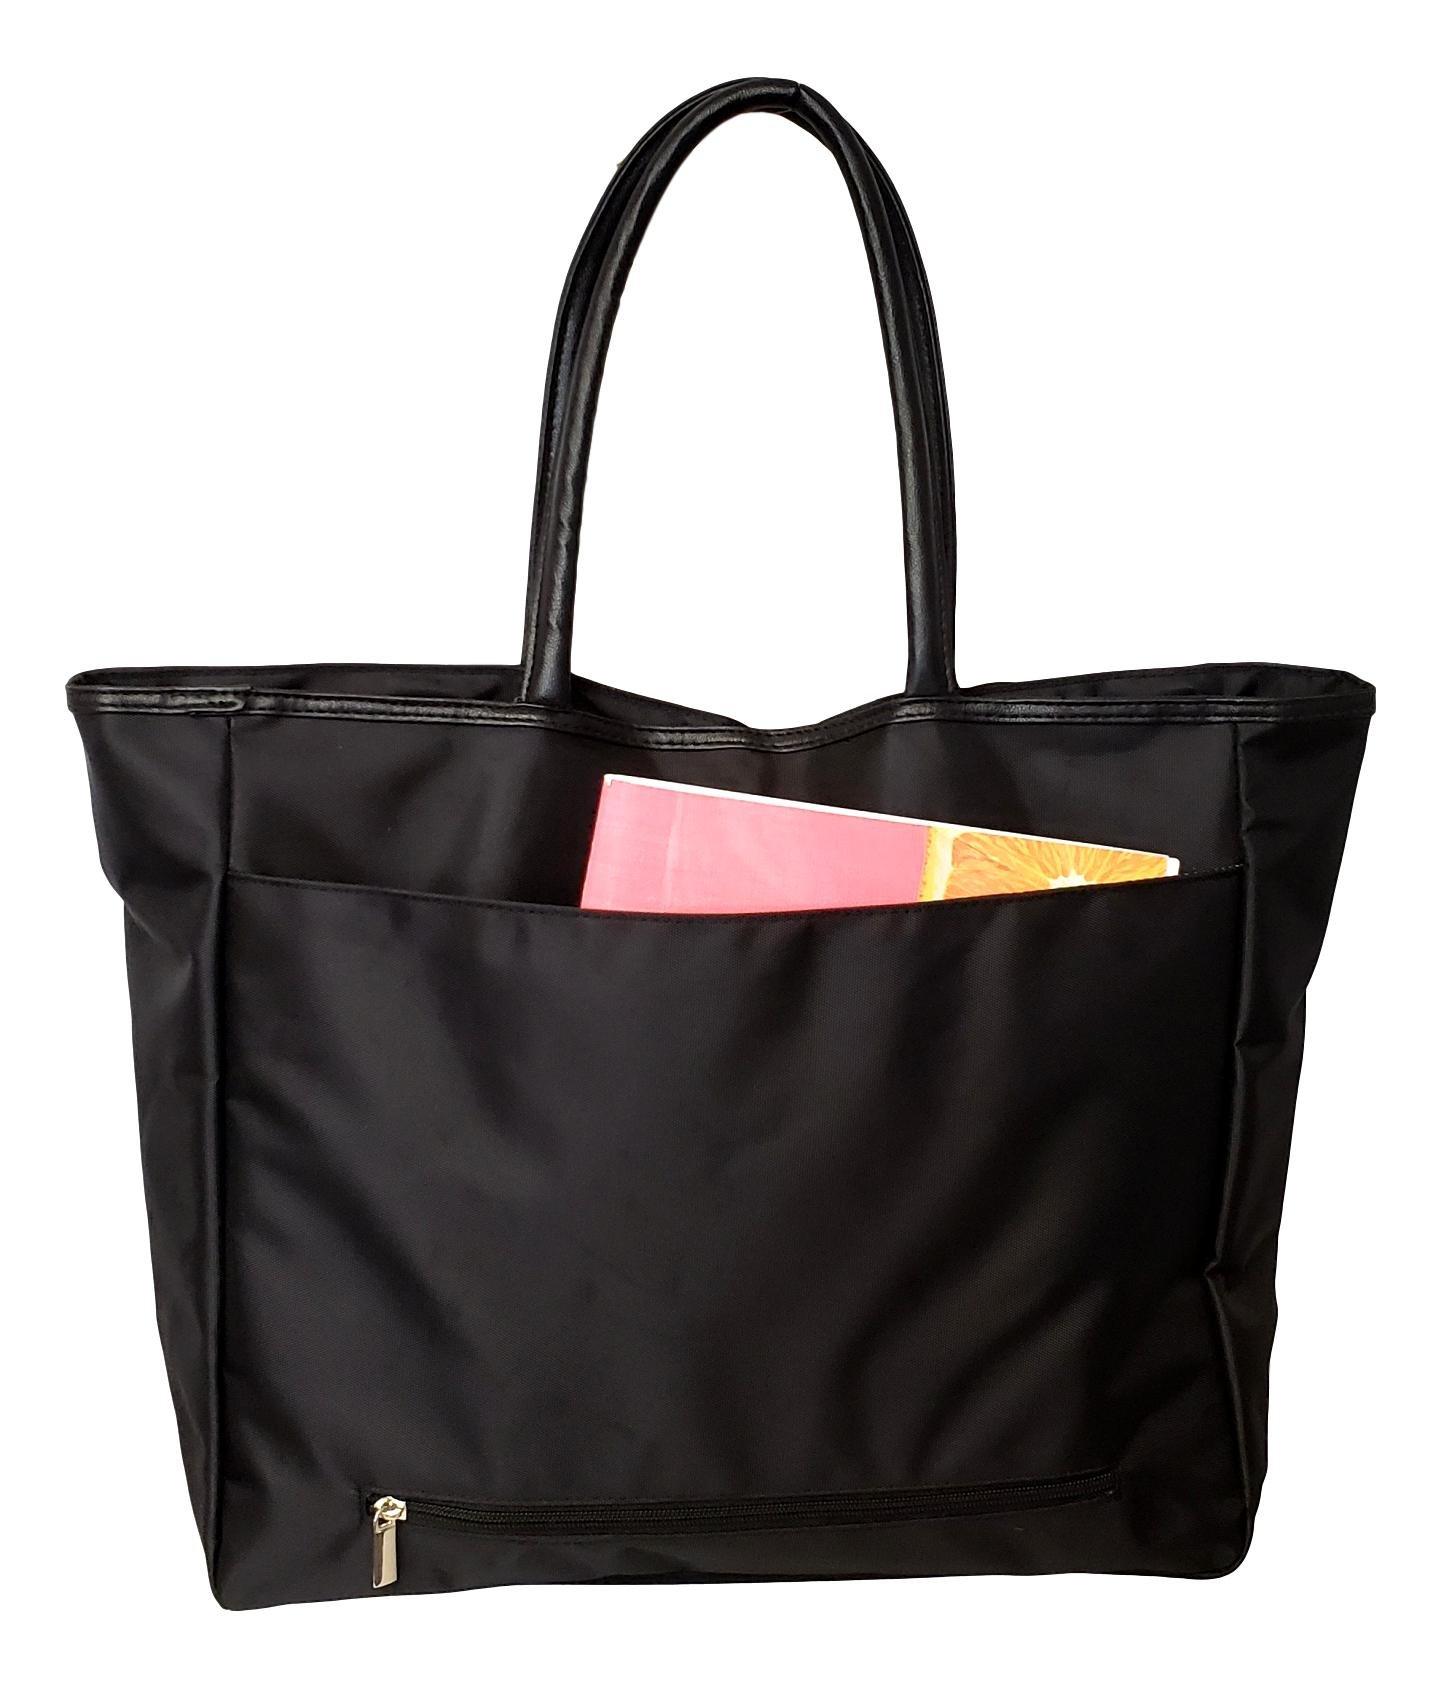 Large Black Organizing Travel Companion Purse Handbag Bag (No Embroidery - Black) by Sona G Designs (Image #3)